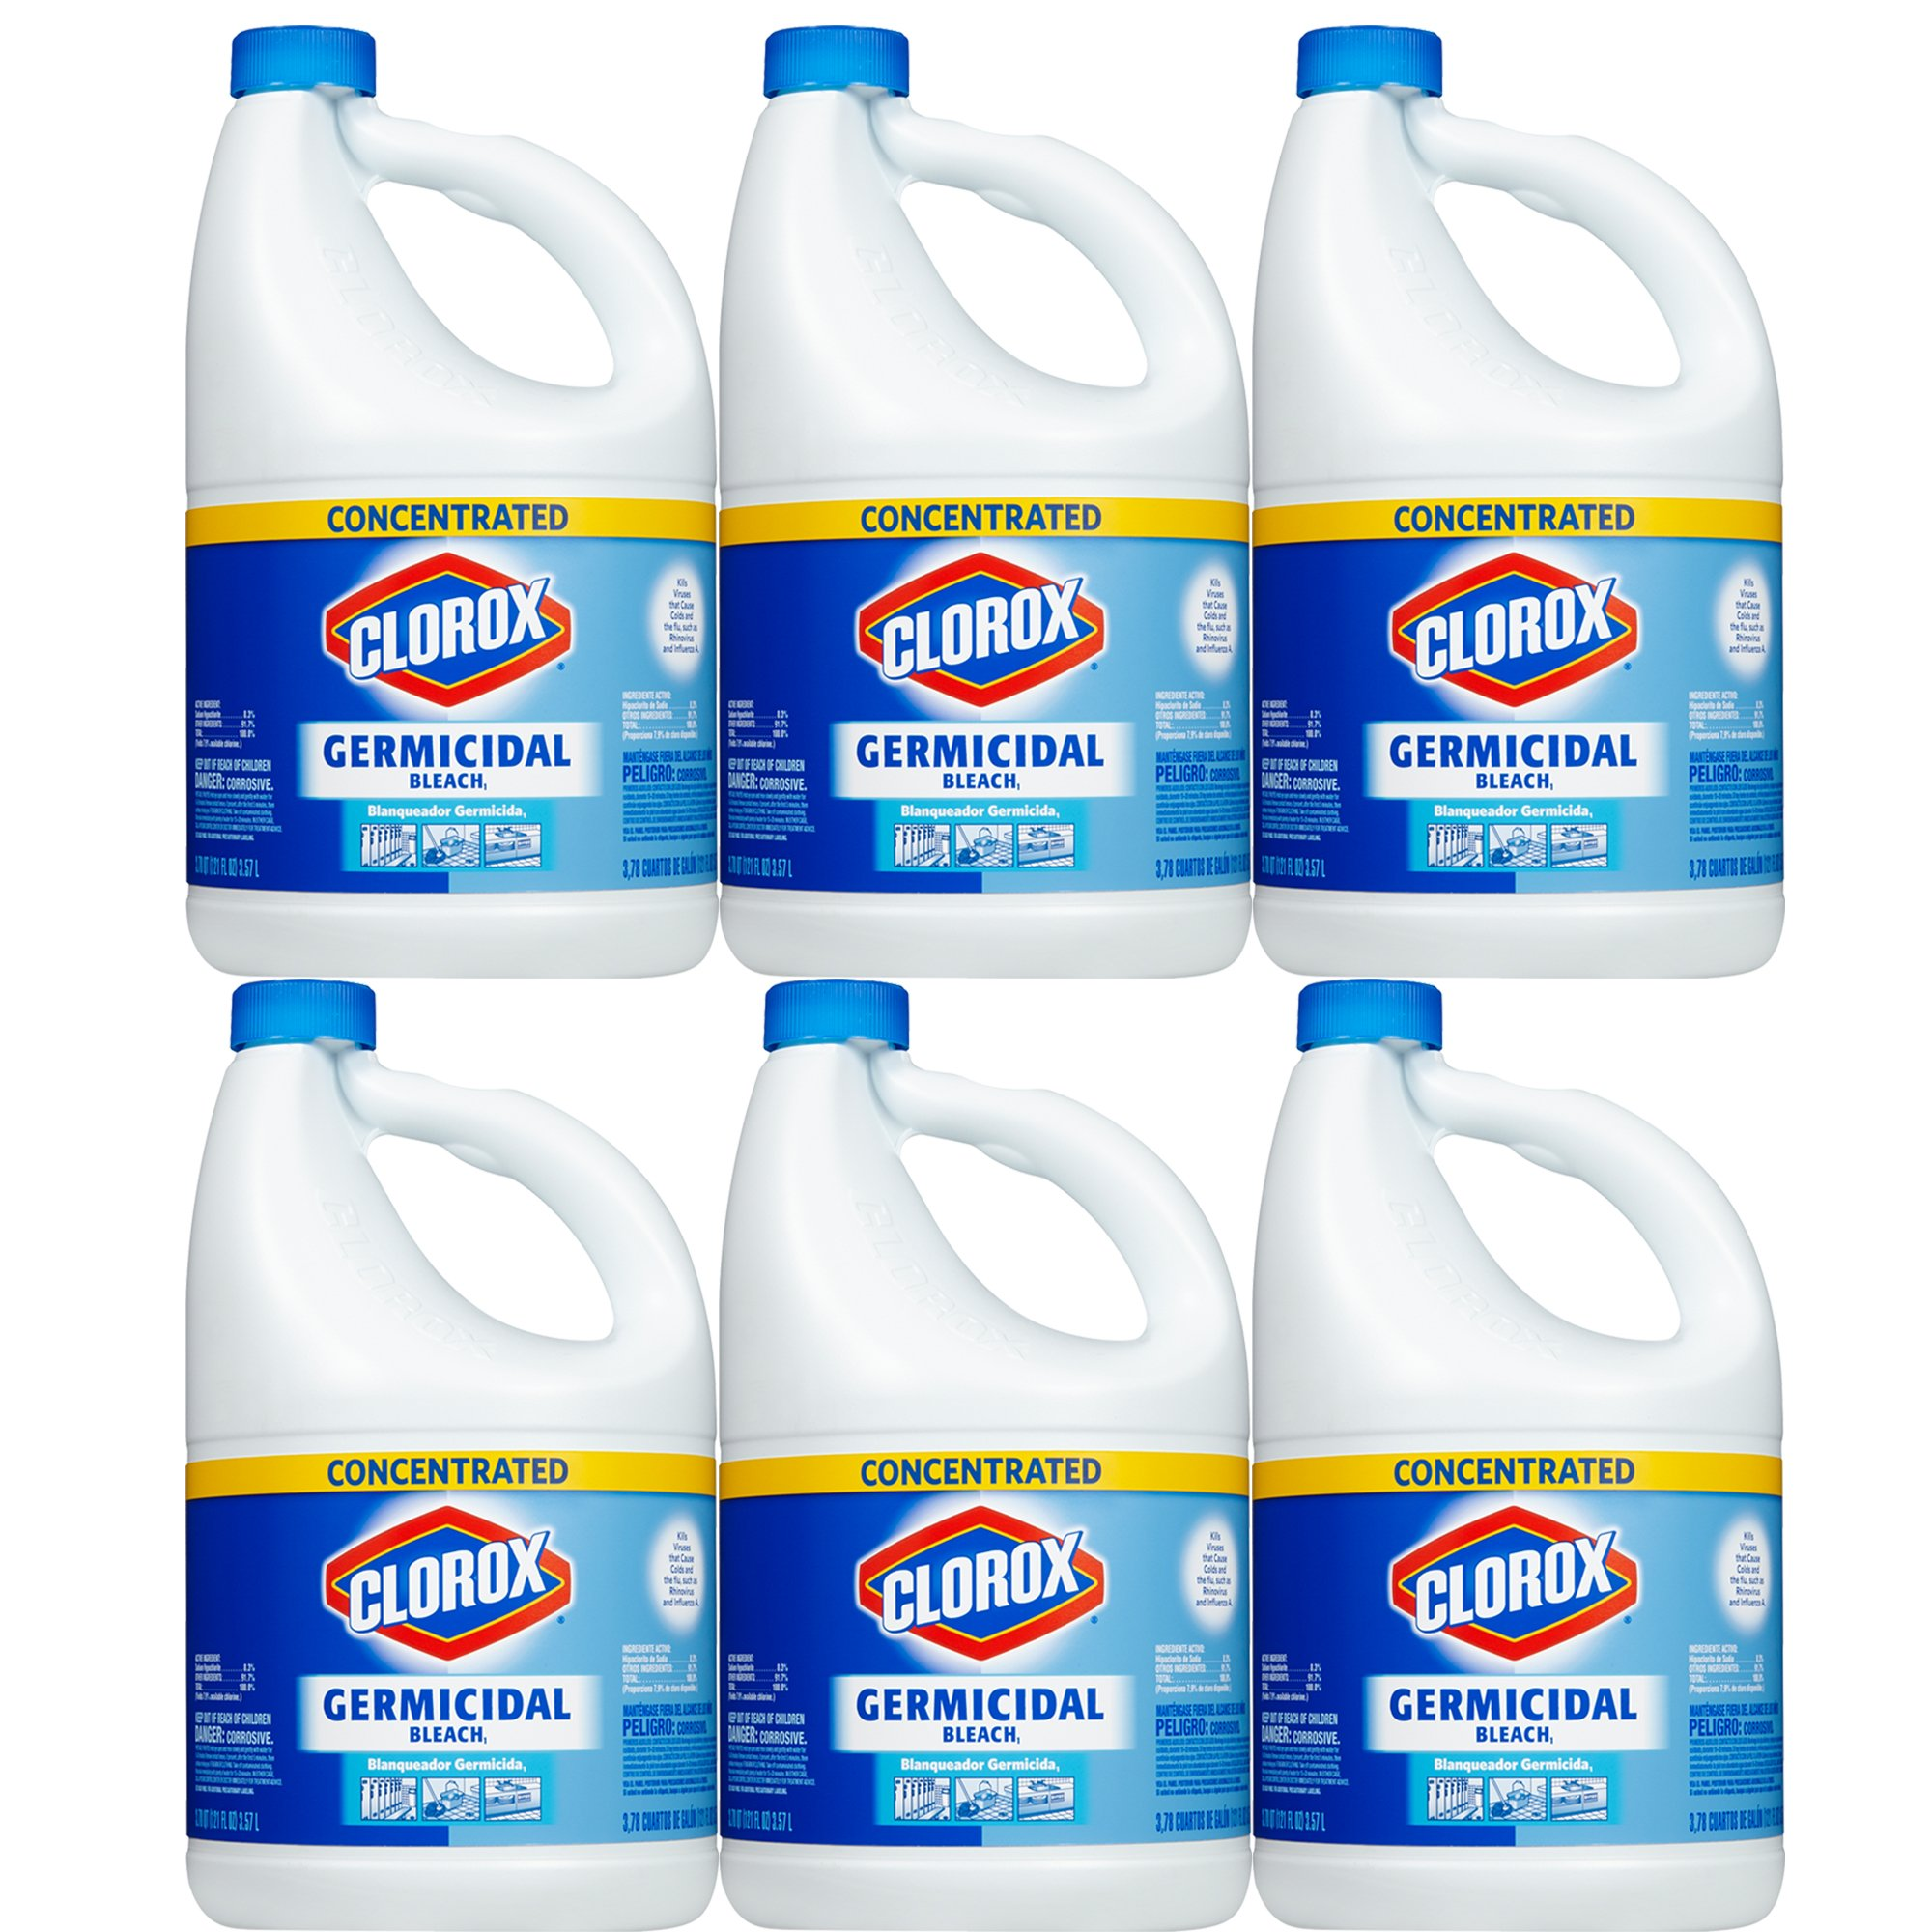 Clorox Germicidal Concentrated Liquid Bleach, 121 oz, 6-Pack